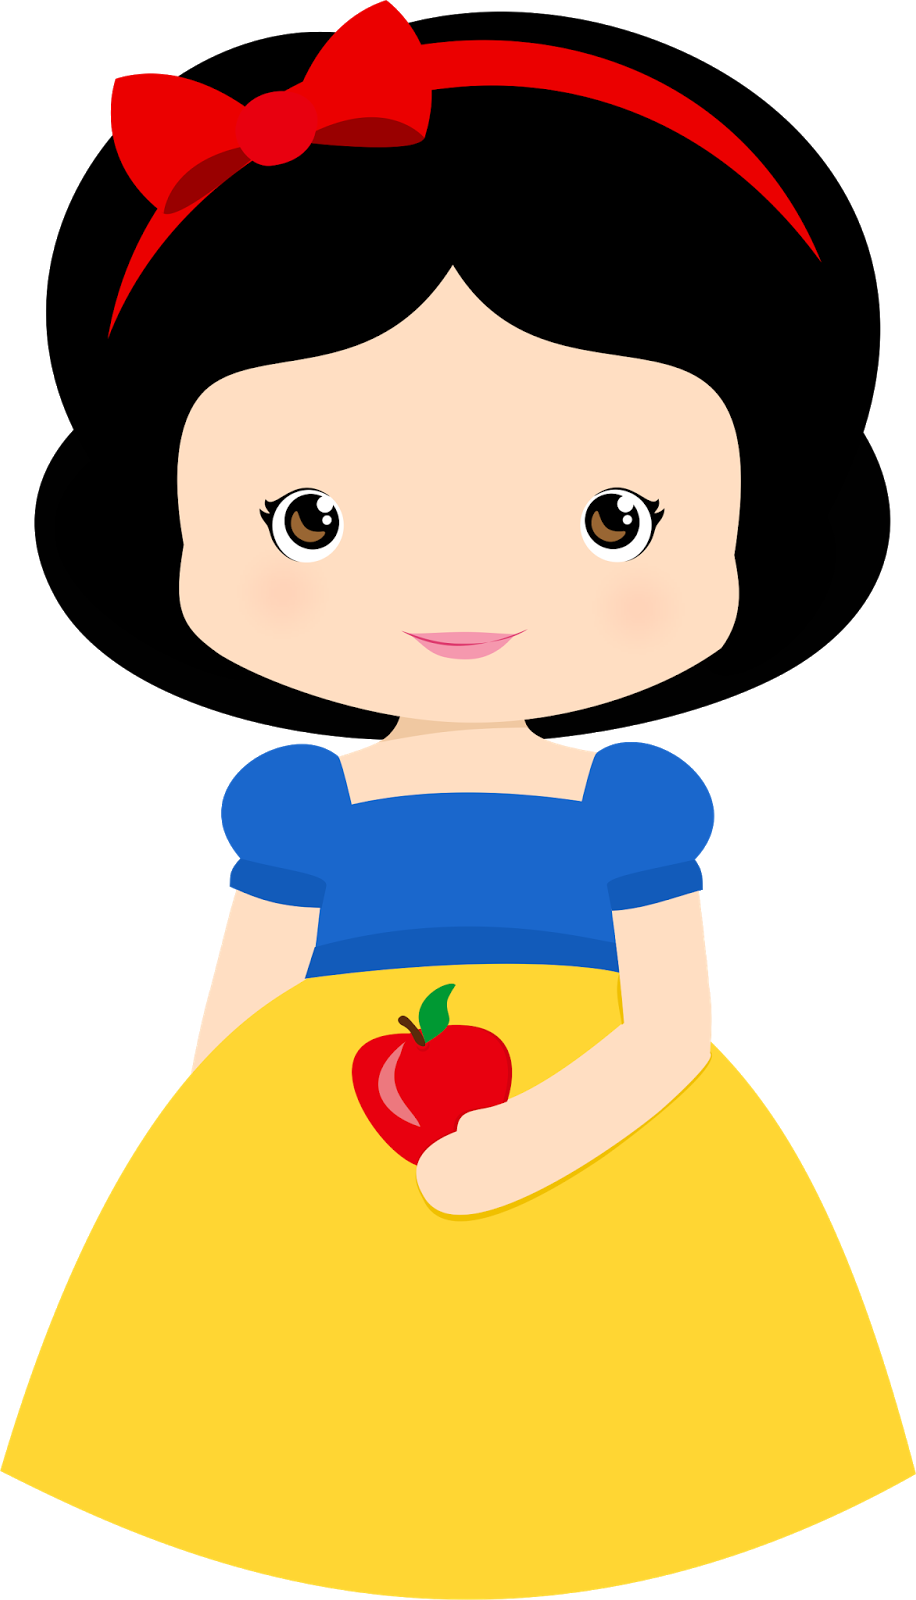 Snow White Pretty Clipart 009 Png 916 1600 Blancanieves Bebe Princesas Princesas Disney